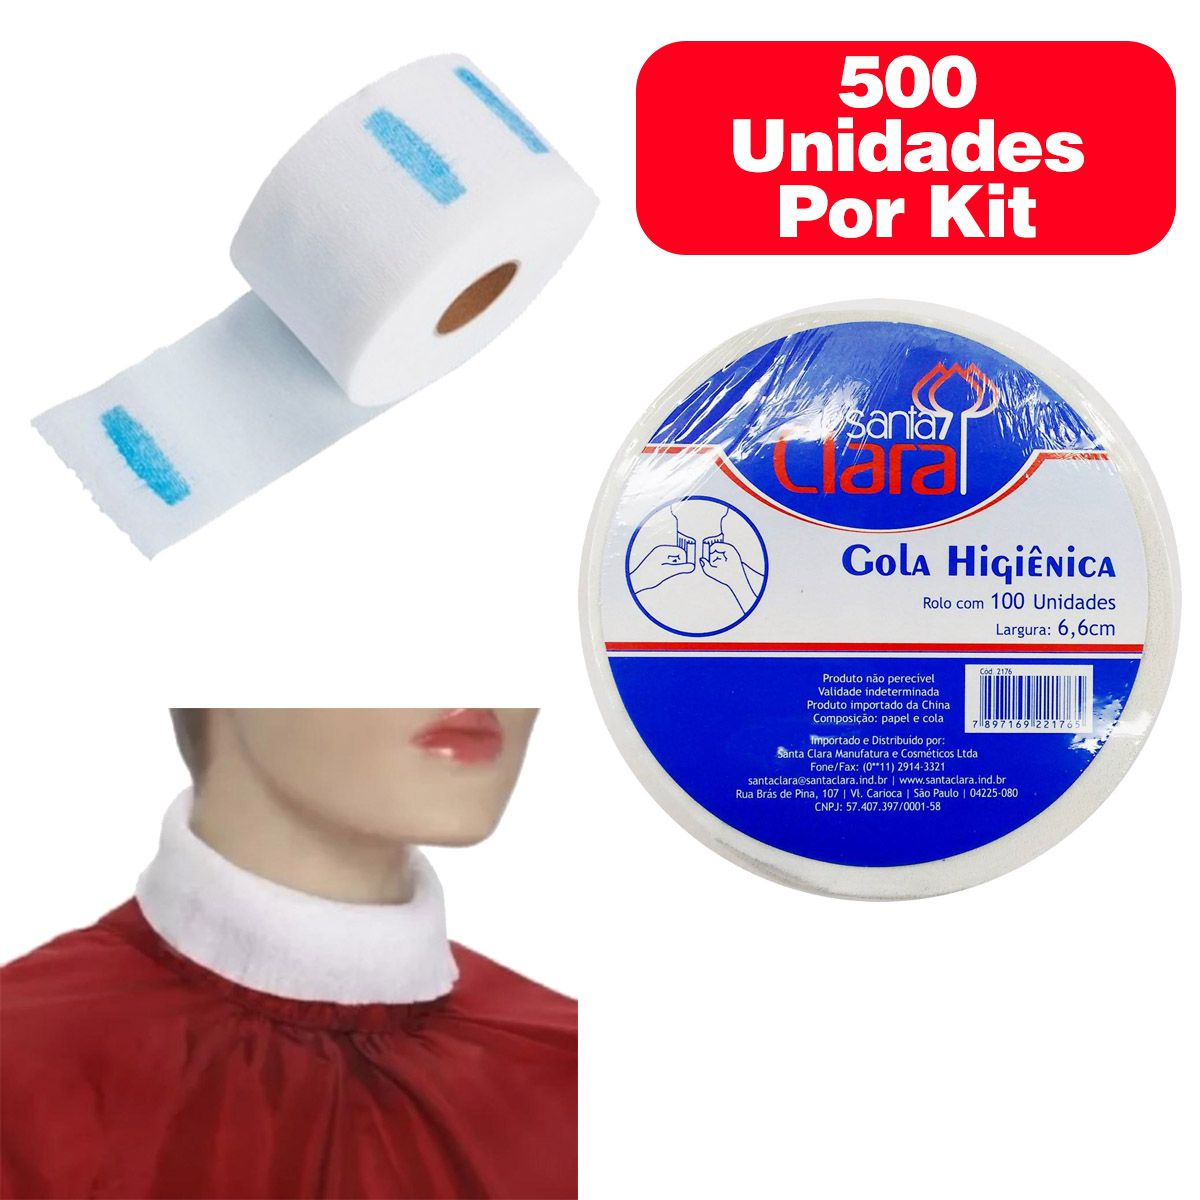 Gola Higienica 5 Rolos C/100 Unidades - 500 unidades